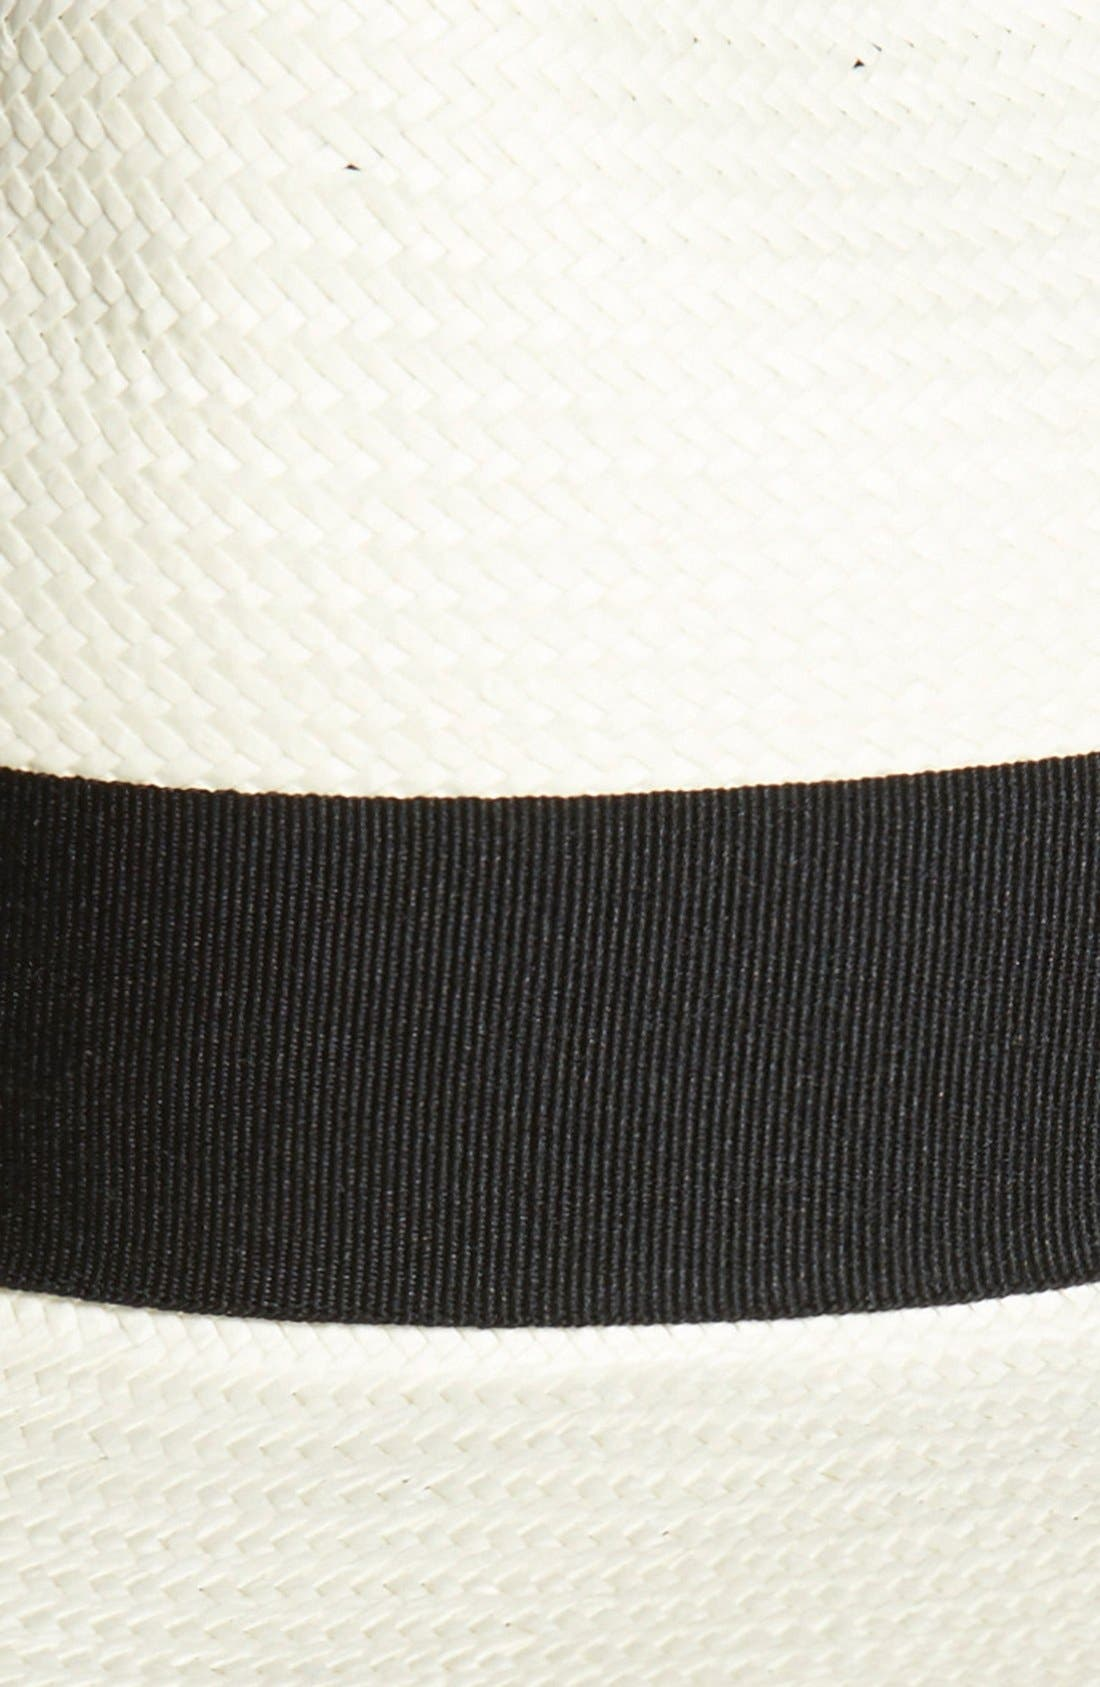 MADEWELL, Panama Hat, Alternate thumbnail 5, color, 250